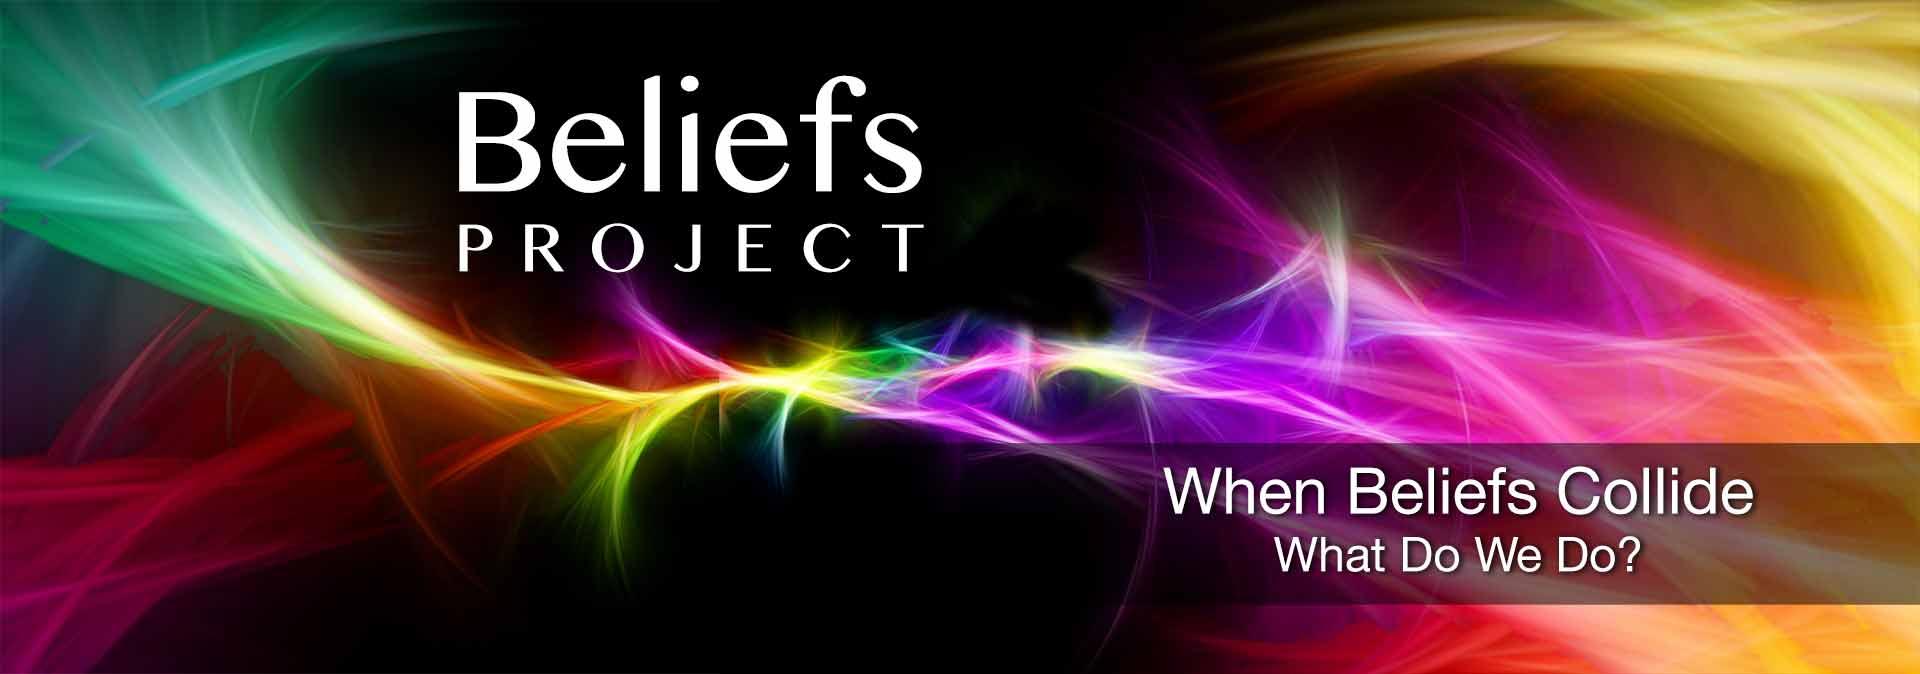 beliefs-splash-v10